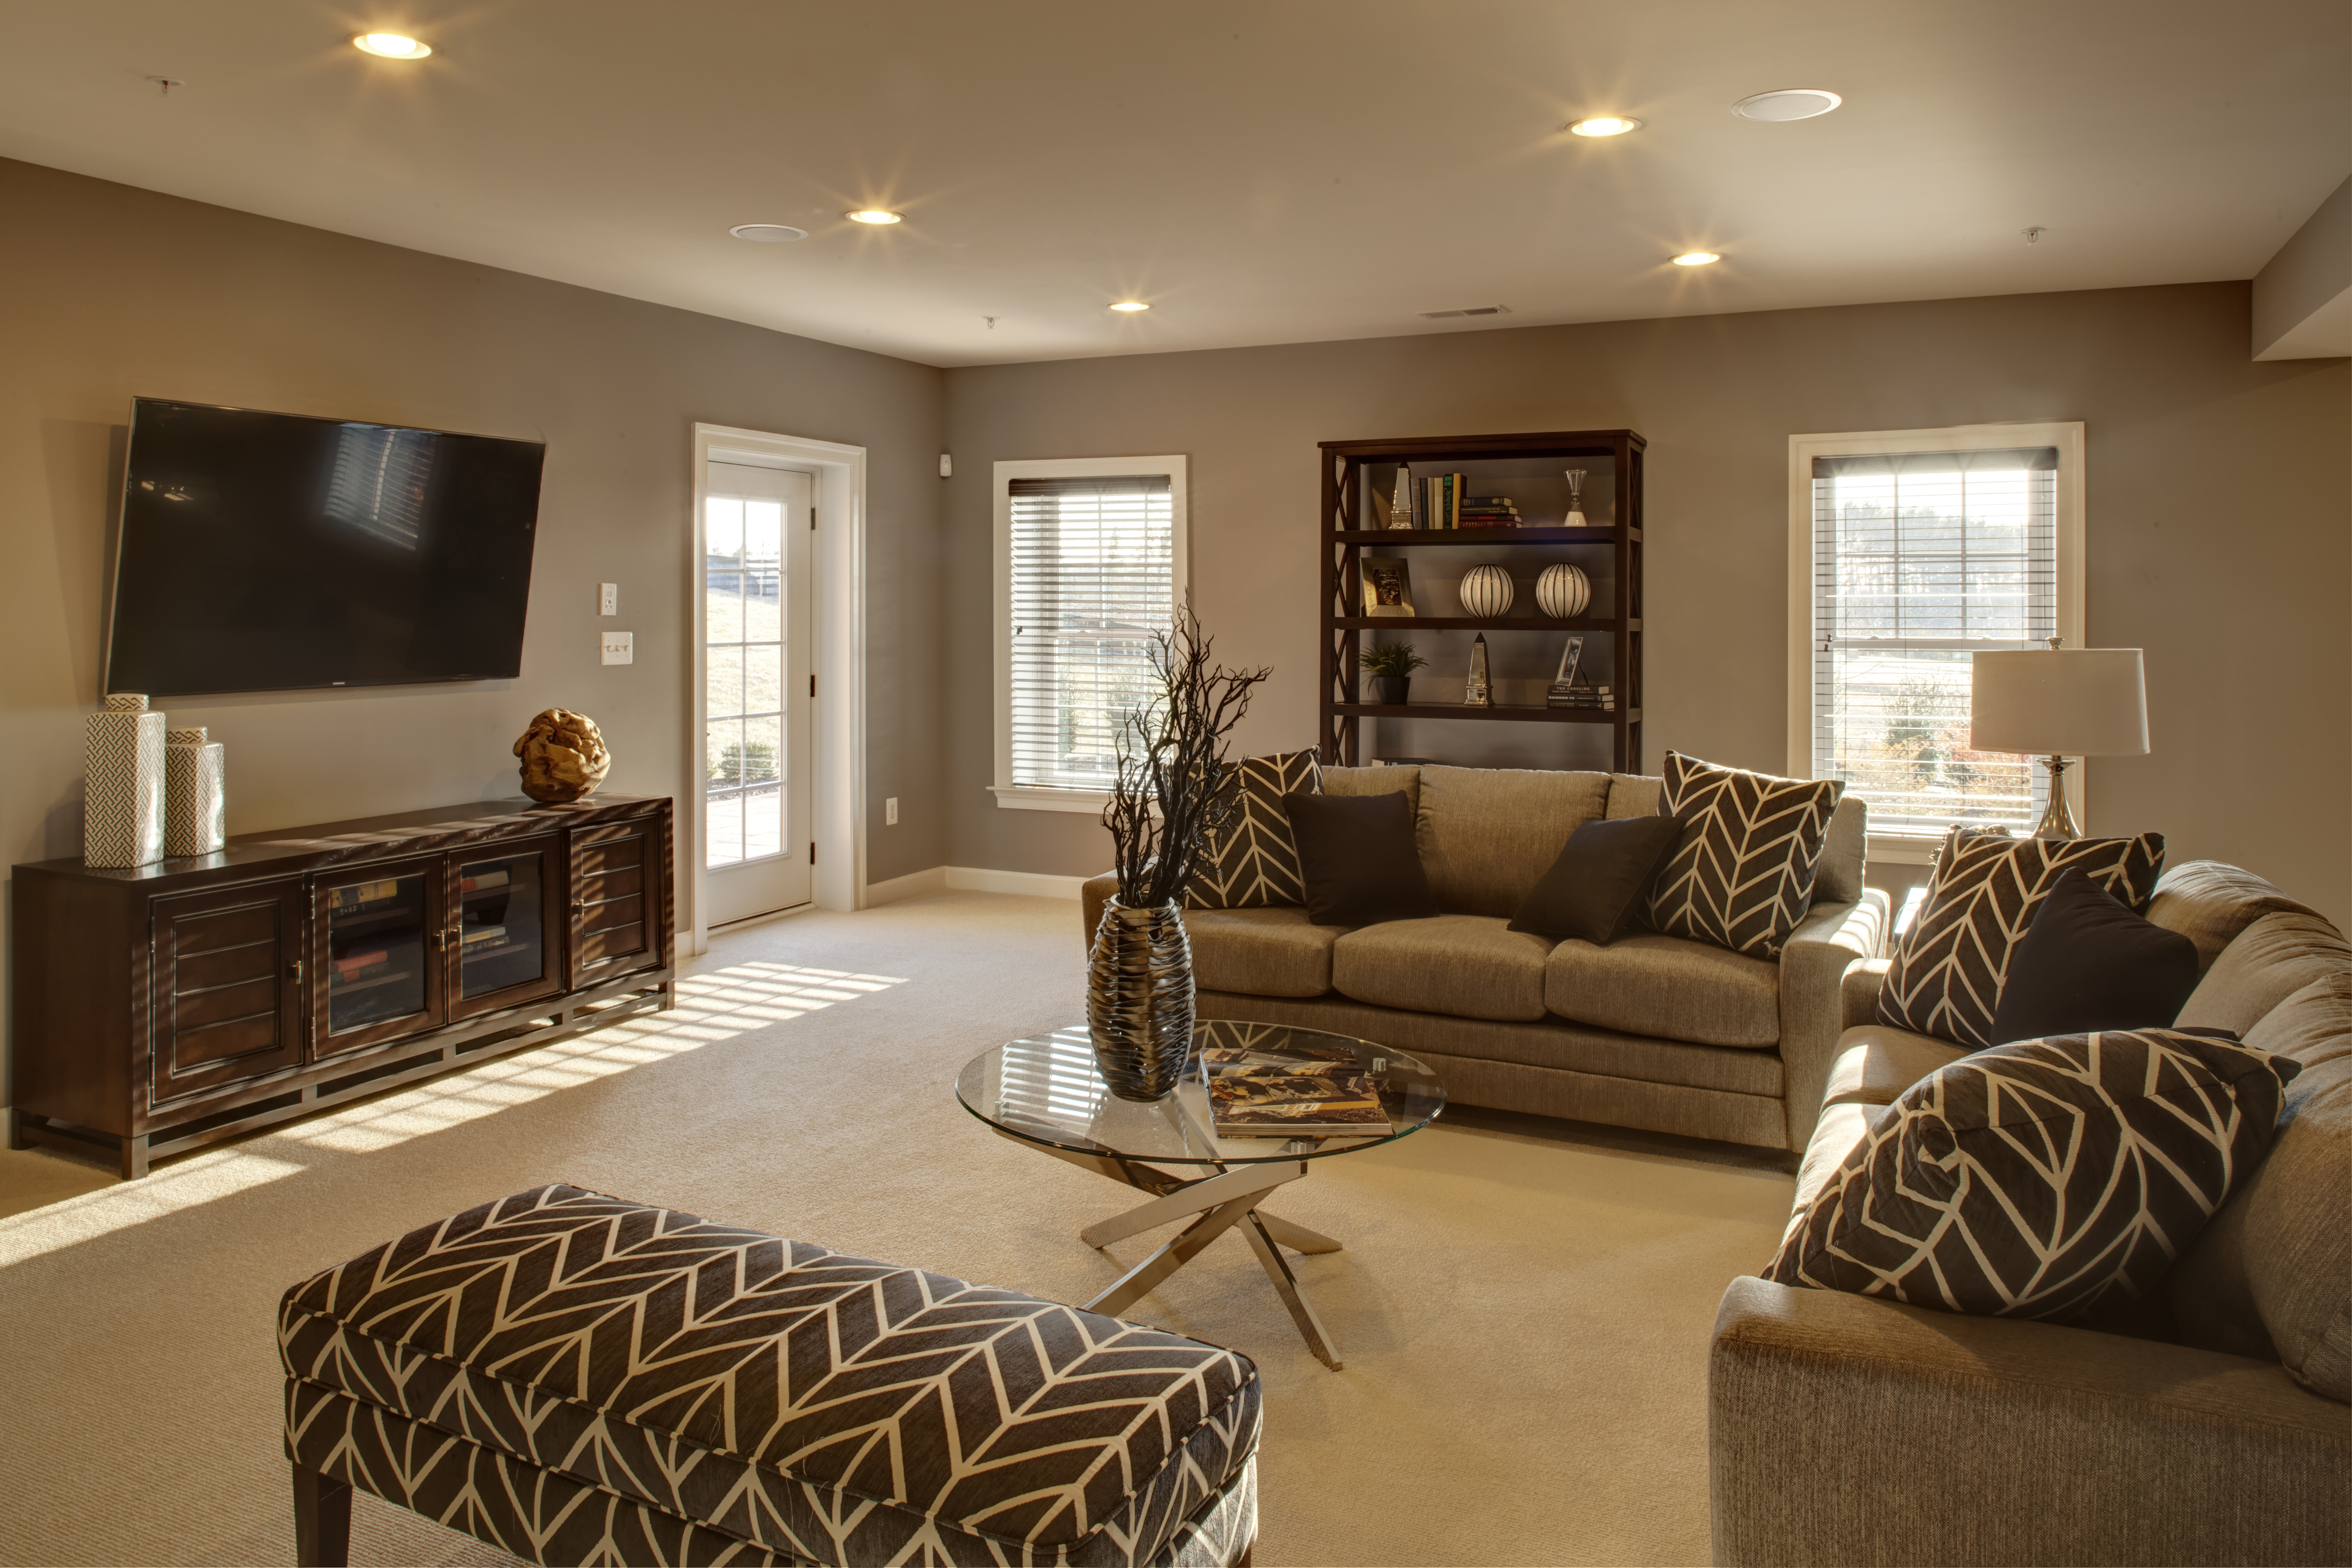 model home furniture for sale. Model Home Furniture For Sale